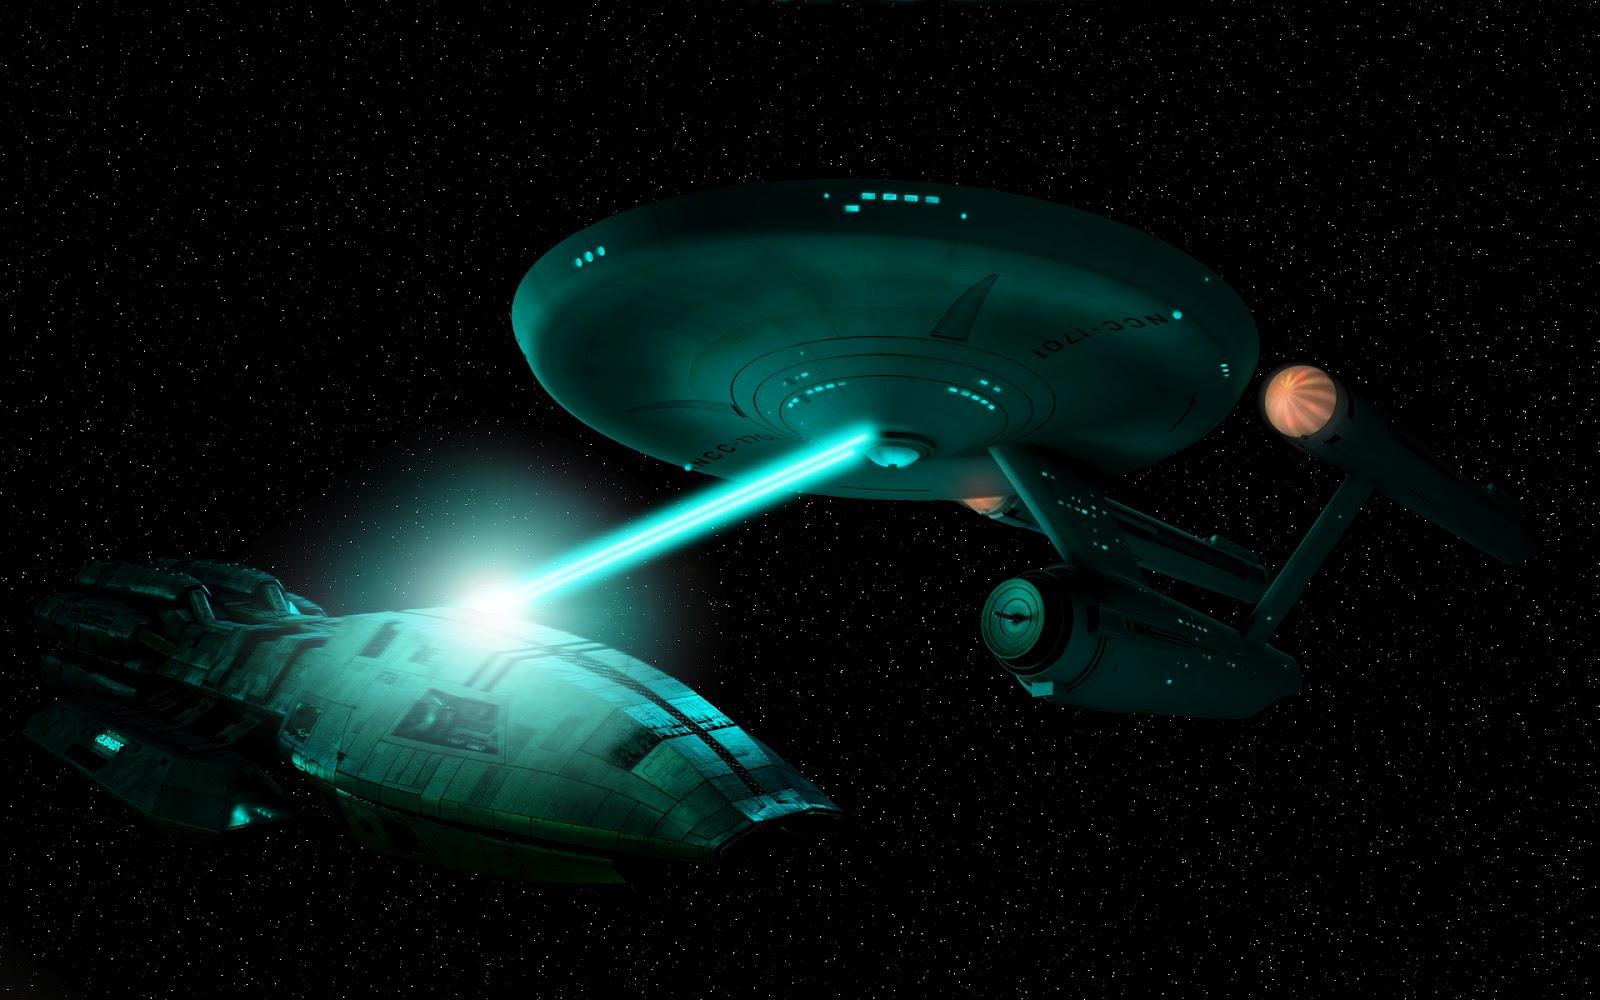 http://1.bp.blogspot.com/-vaCTOIAm7gE/UCS12sz5asI/AAAAAAAALmo/d_8__iAWDNs/s1600/star-trek-war.jpg